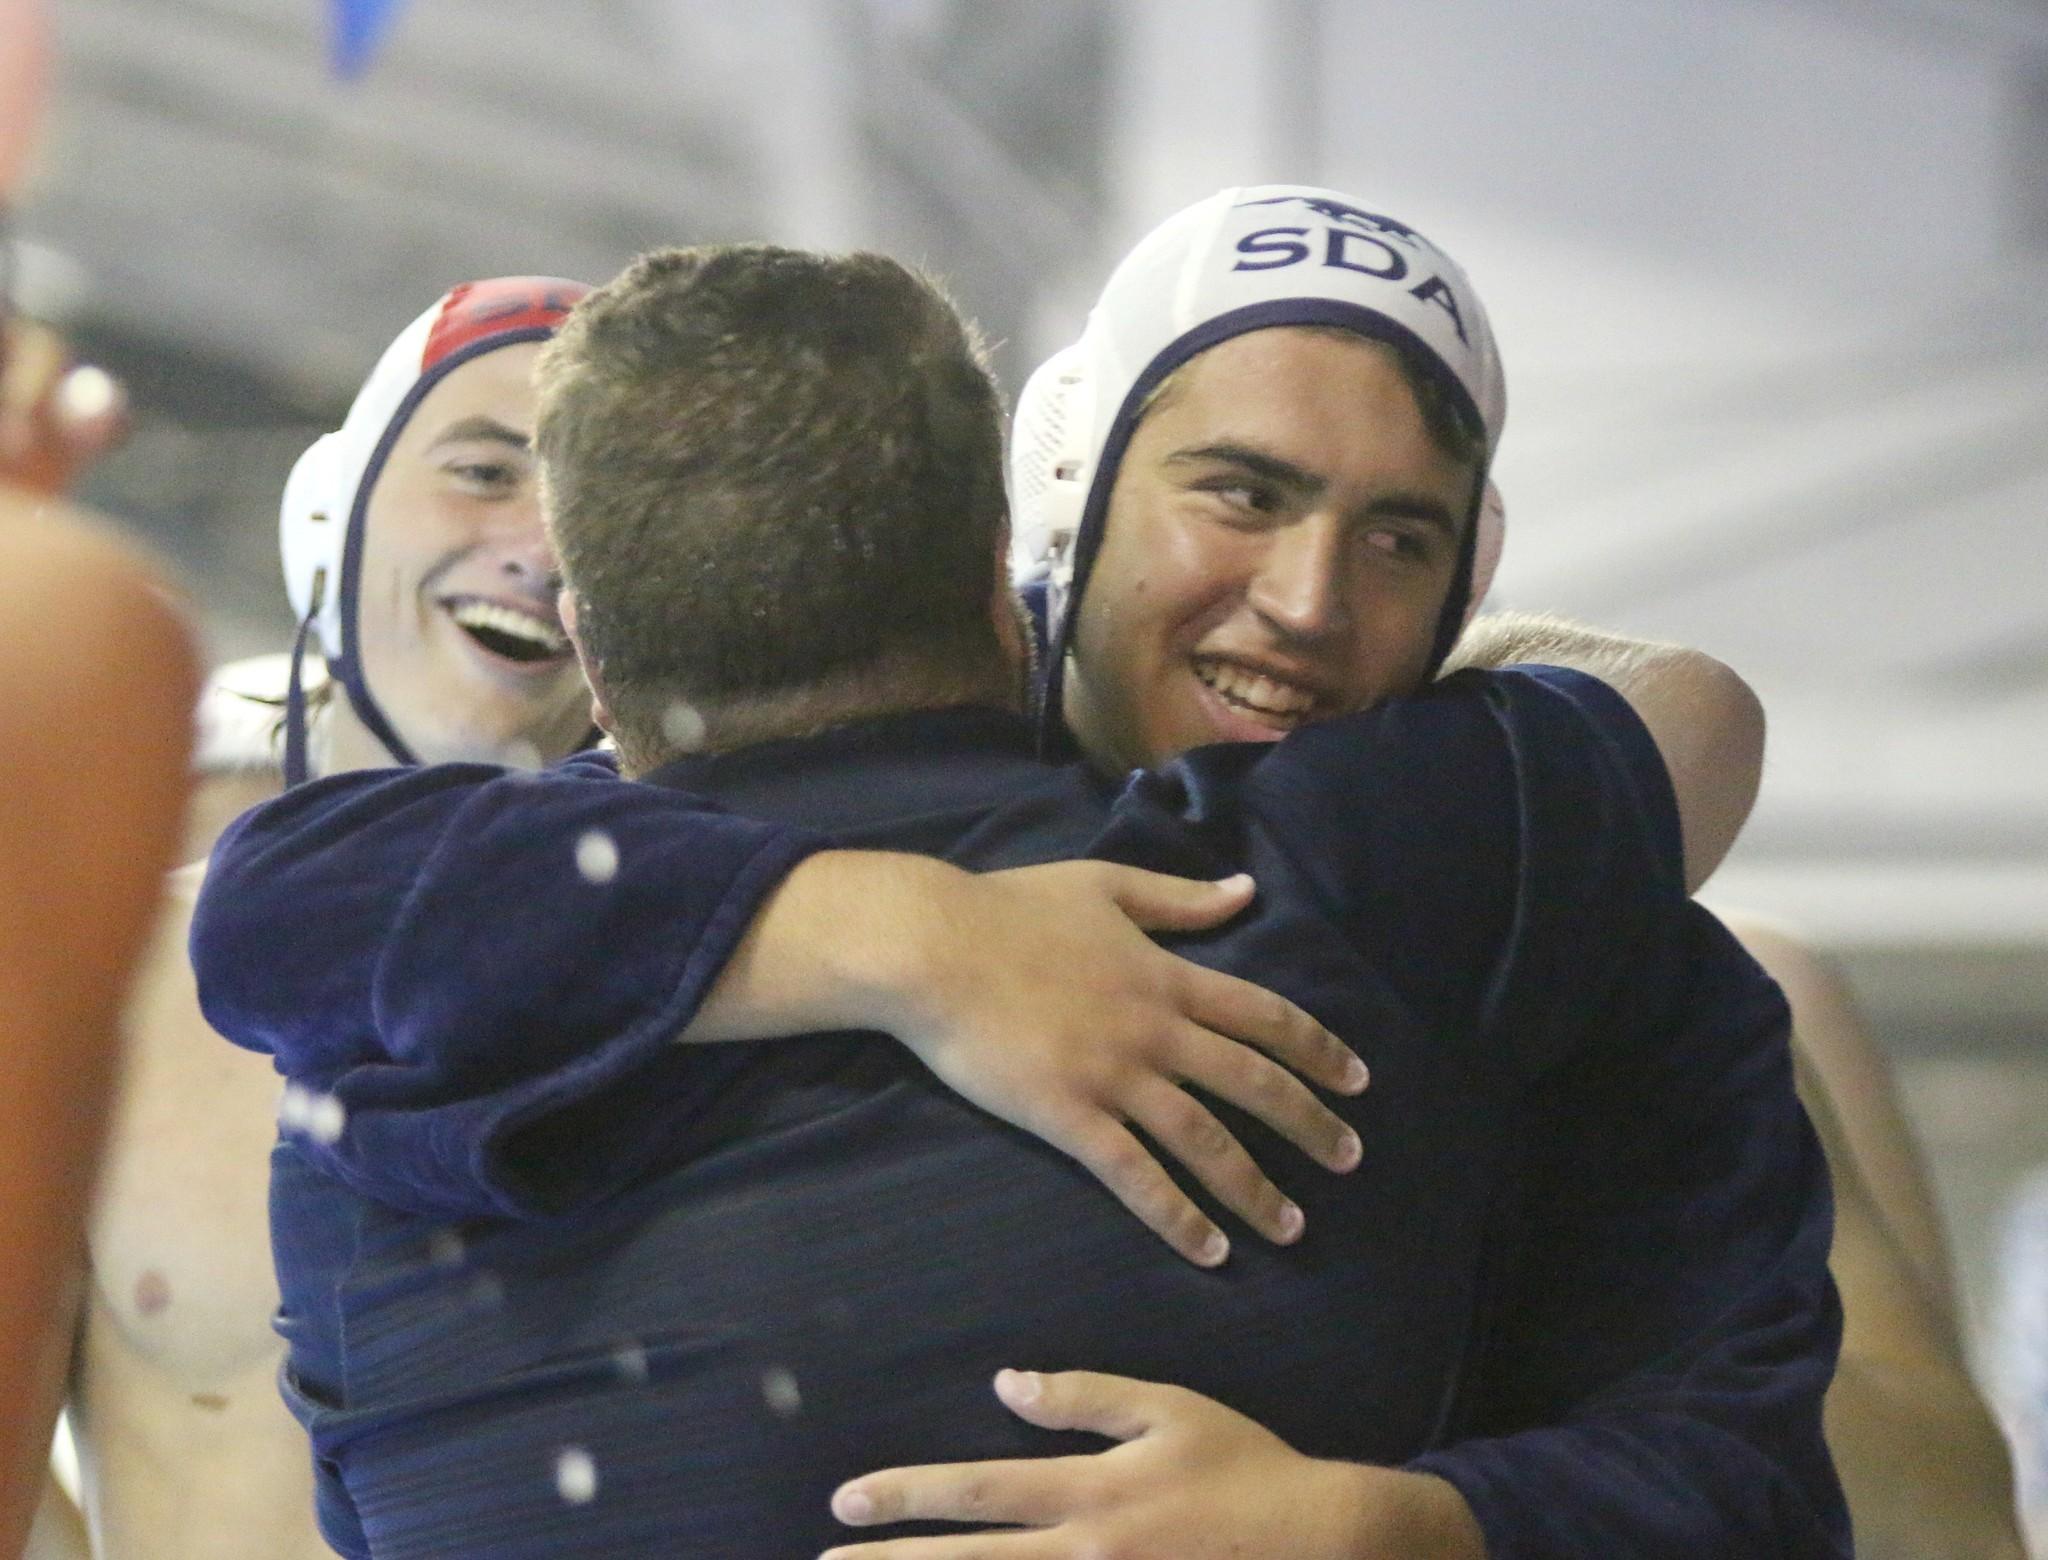 Matheus Gensler receives a congratulatory hug.